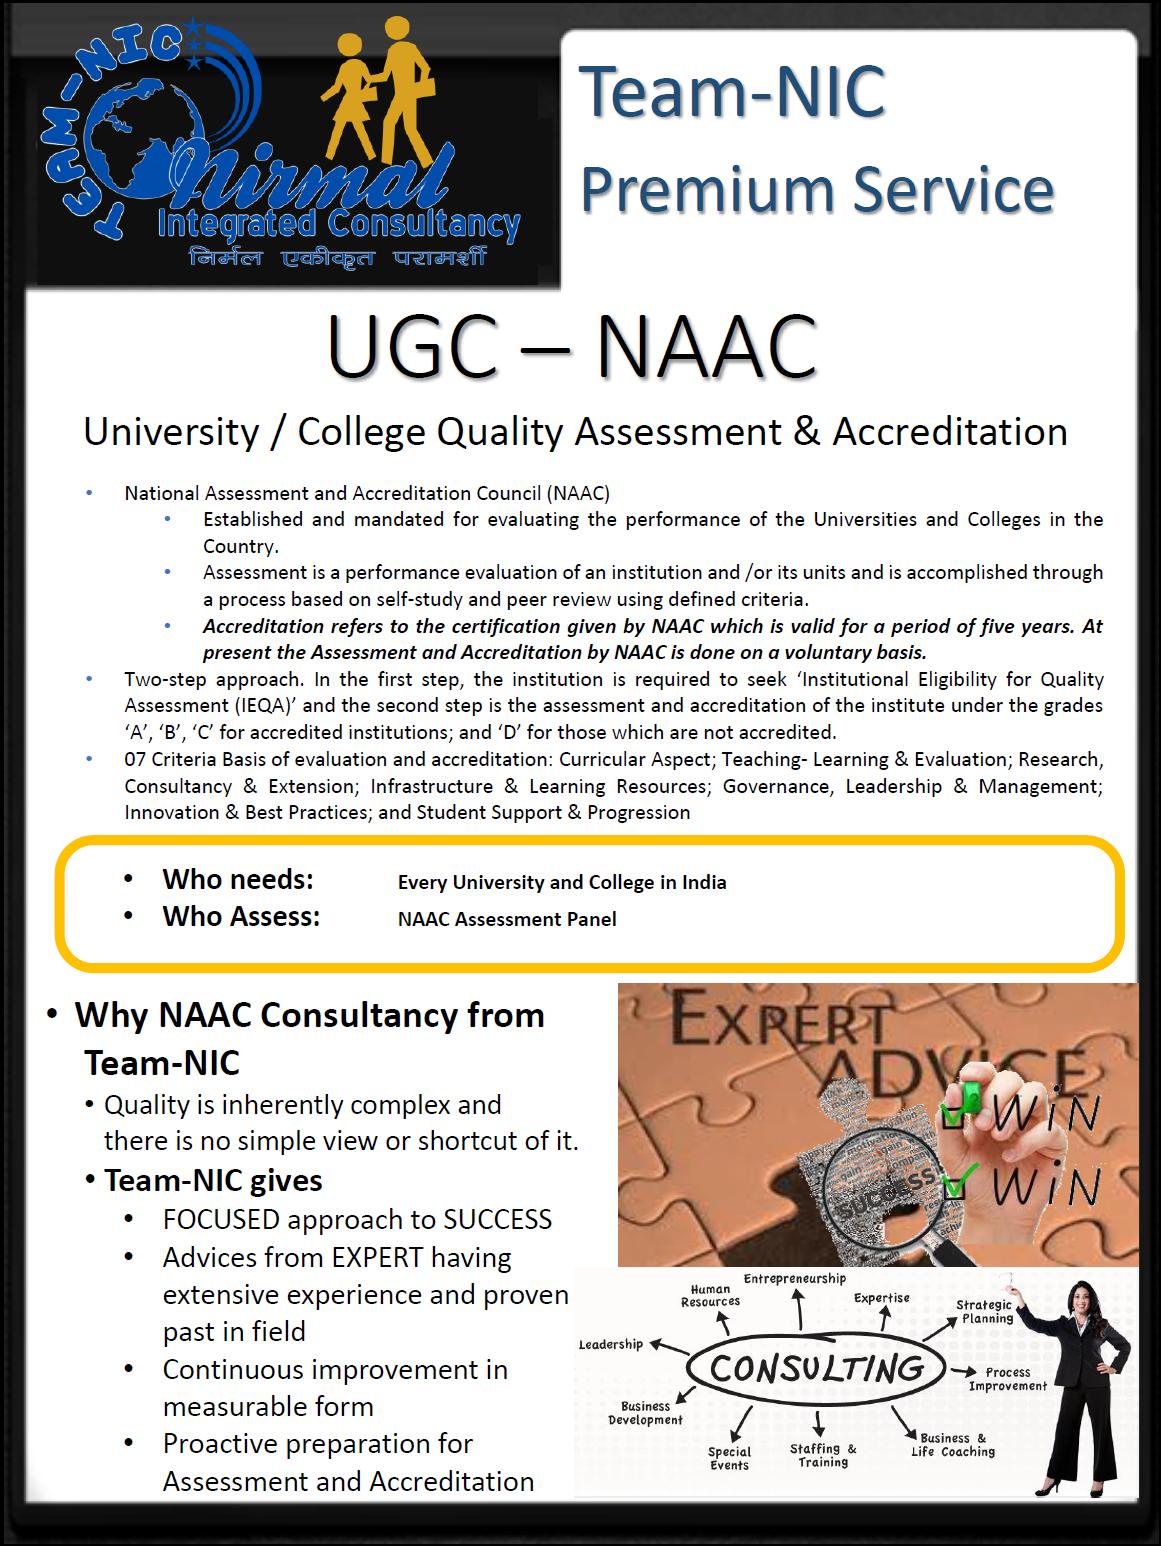 NAAC Advisory and Consultancy - Prof  (Dr ) Deepak Jain